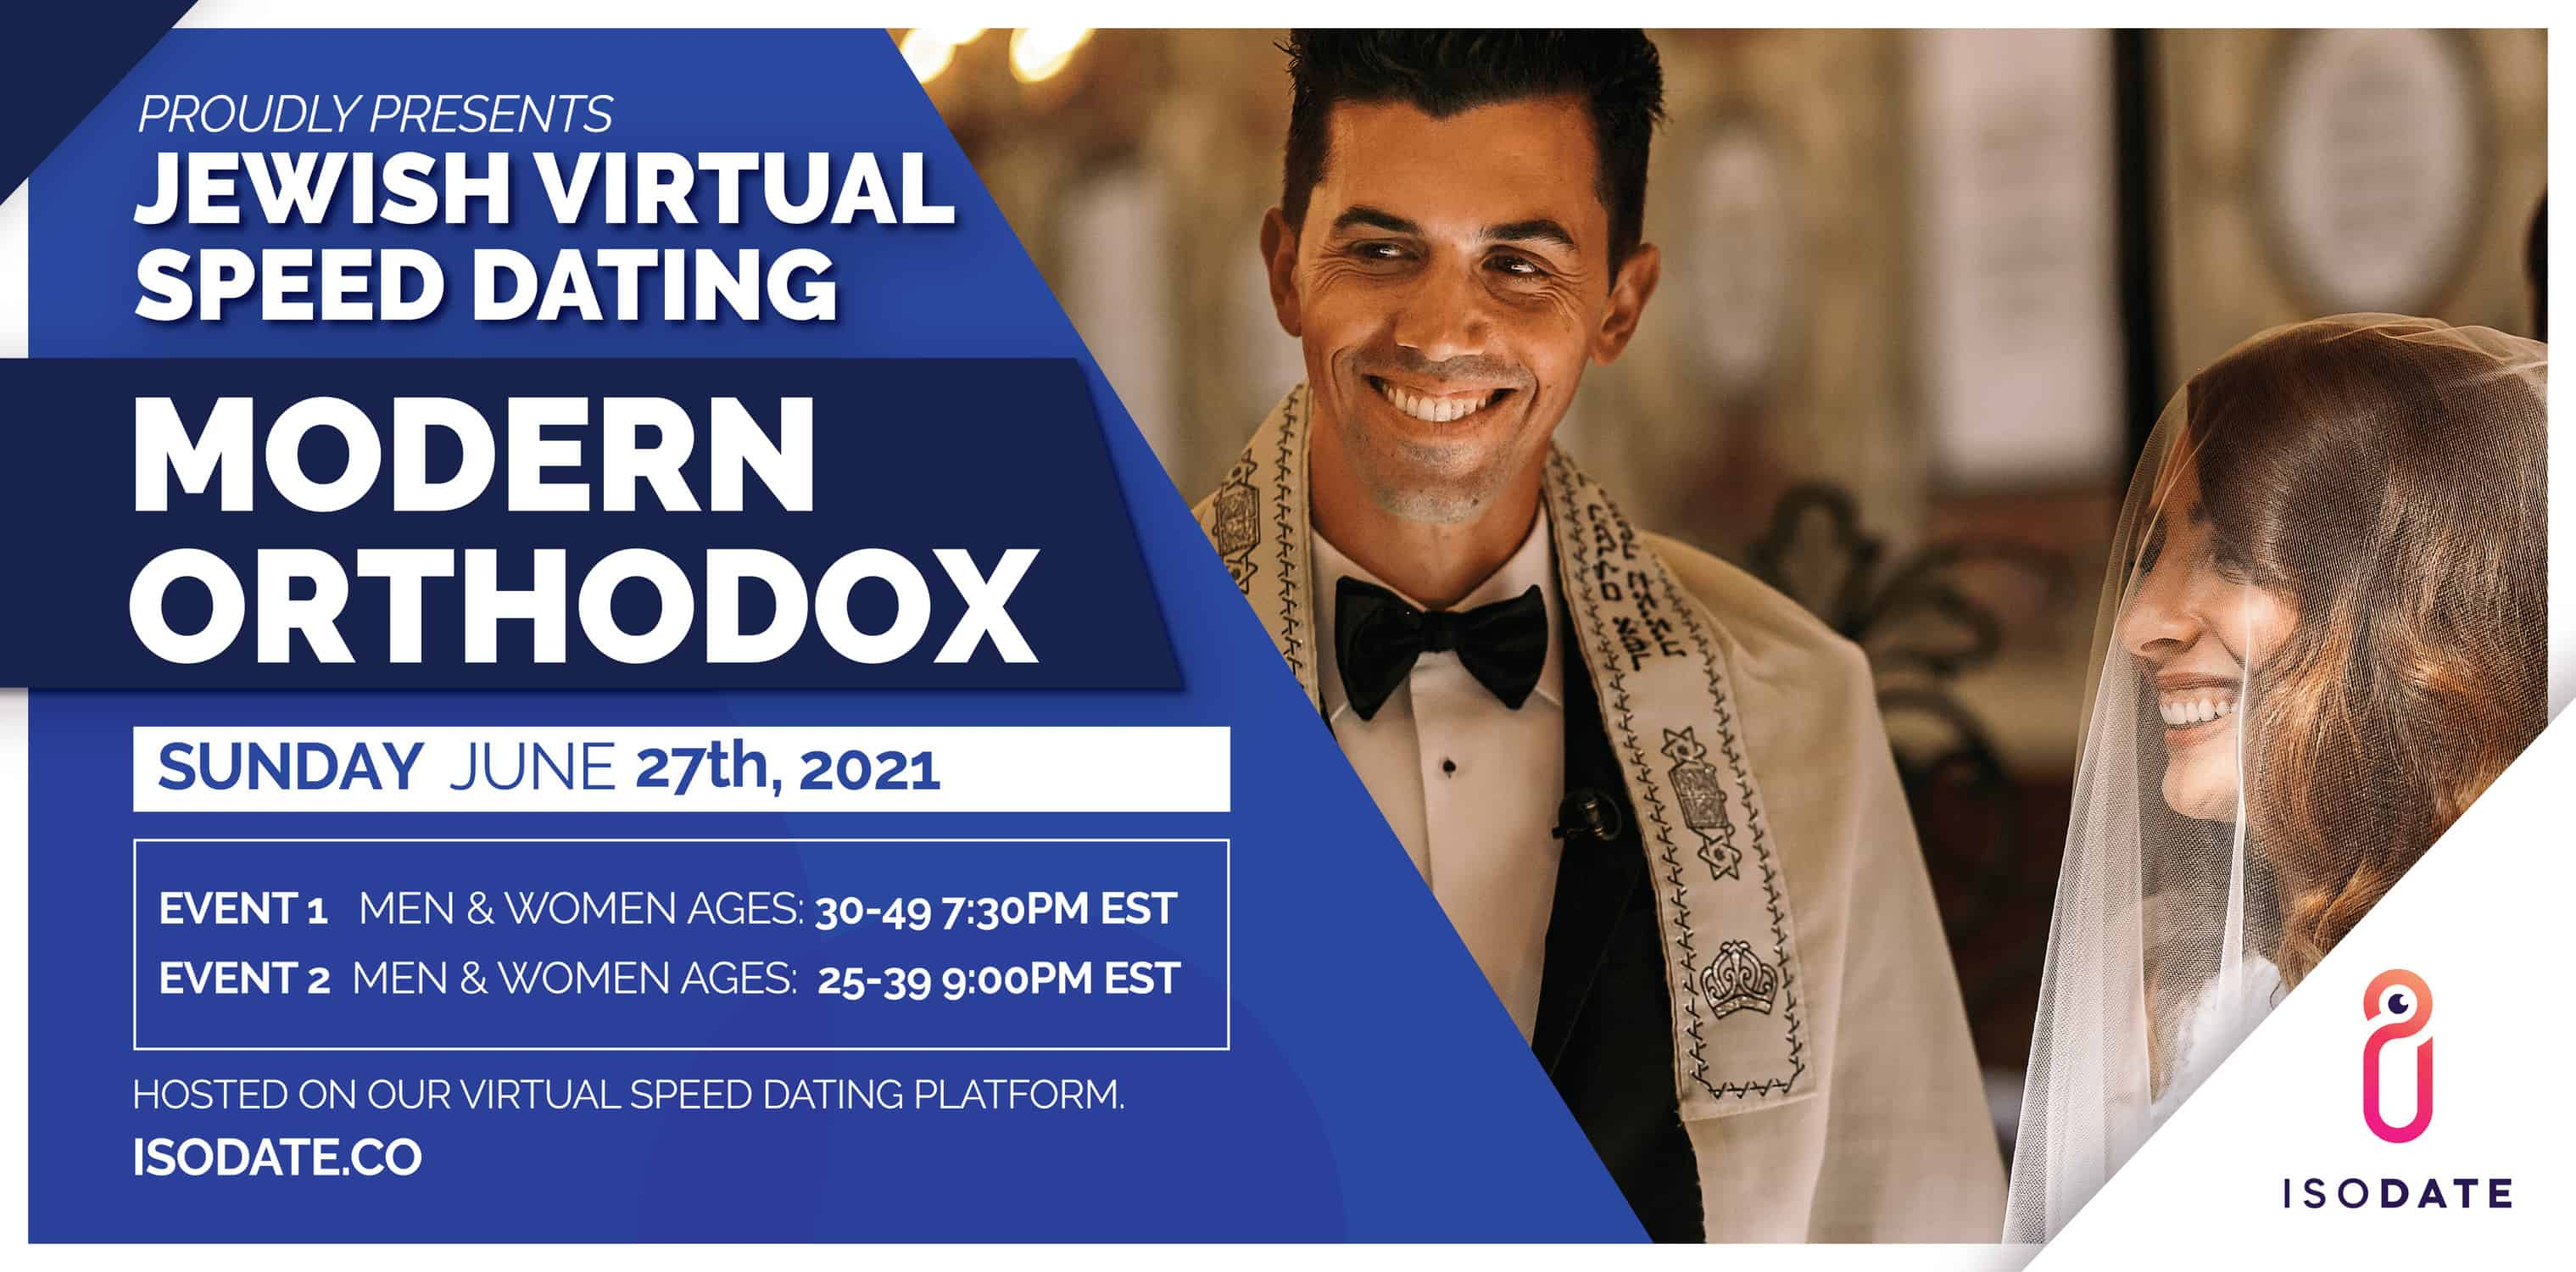 Modern Orthodox Jewish Virtual Speed Dating